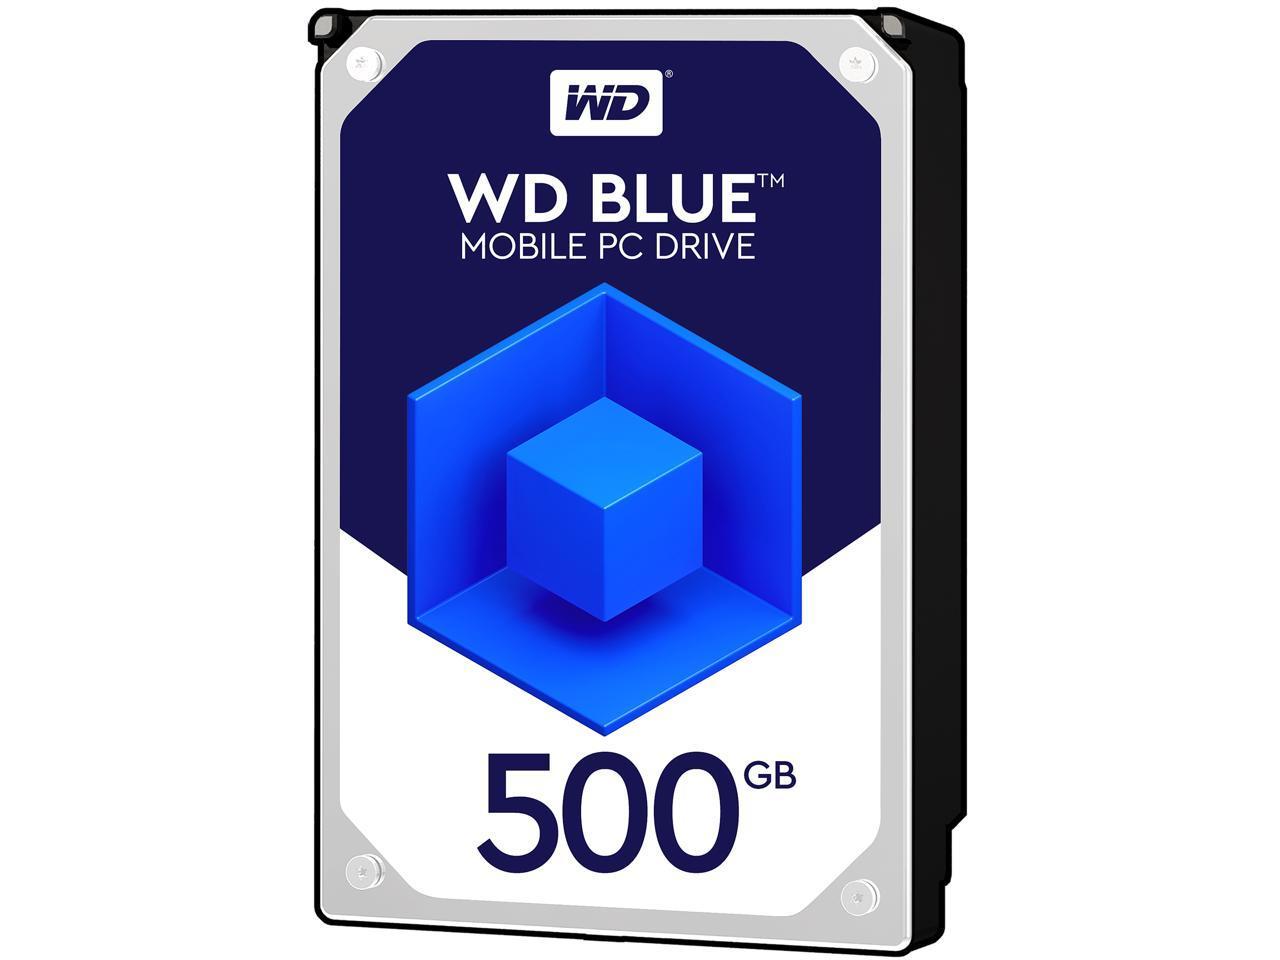 Wd Blue 500gb Mobile 700mm Hard Disk Drive 5400 Rpm Sata 6gb S Hardisk Hdd Internal Pc 320gb New 16mb Cache 25 Inch Wd5000lpcx